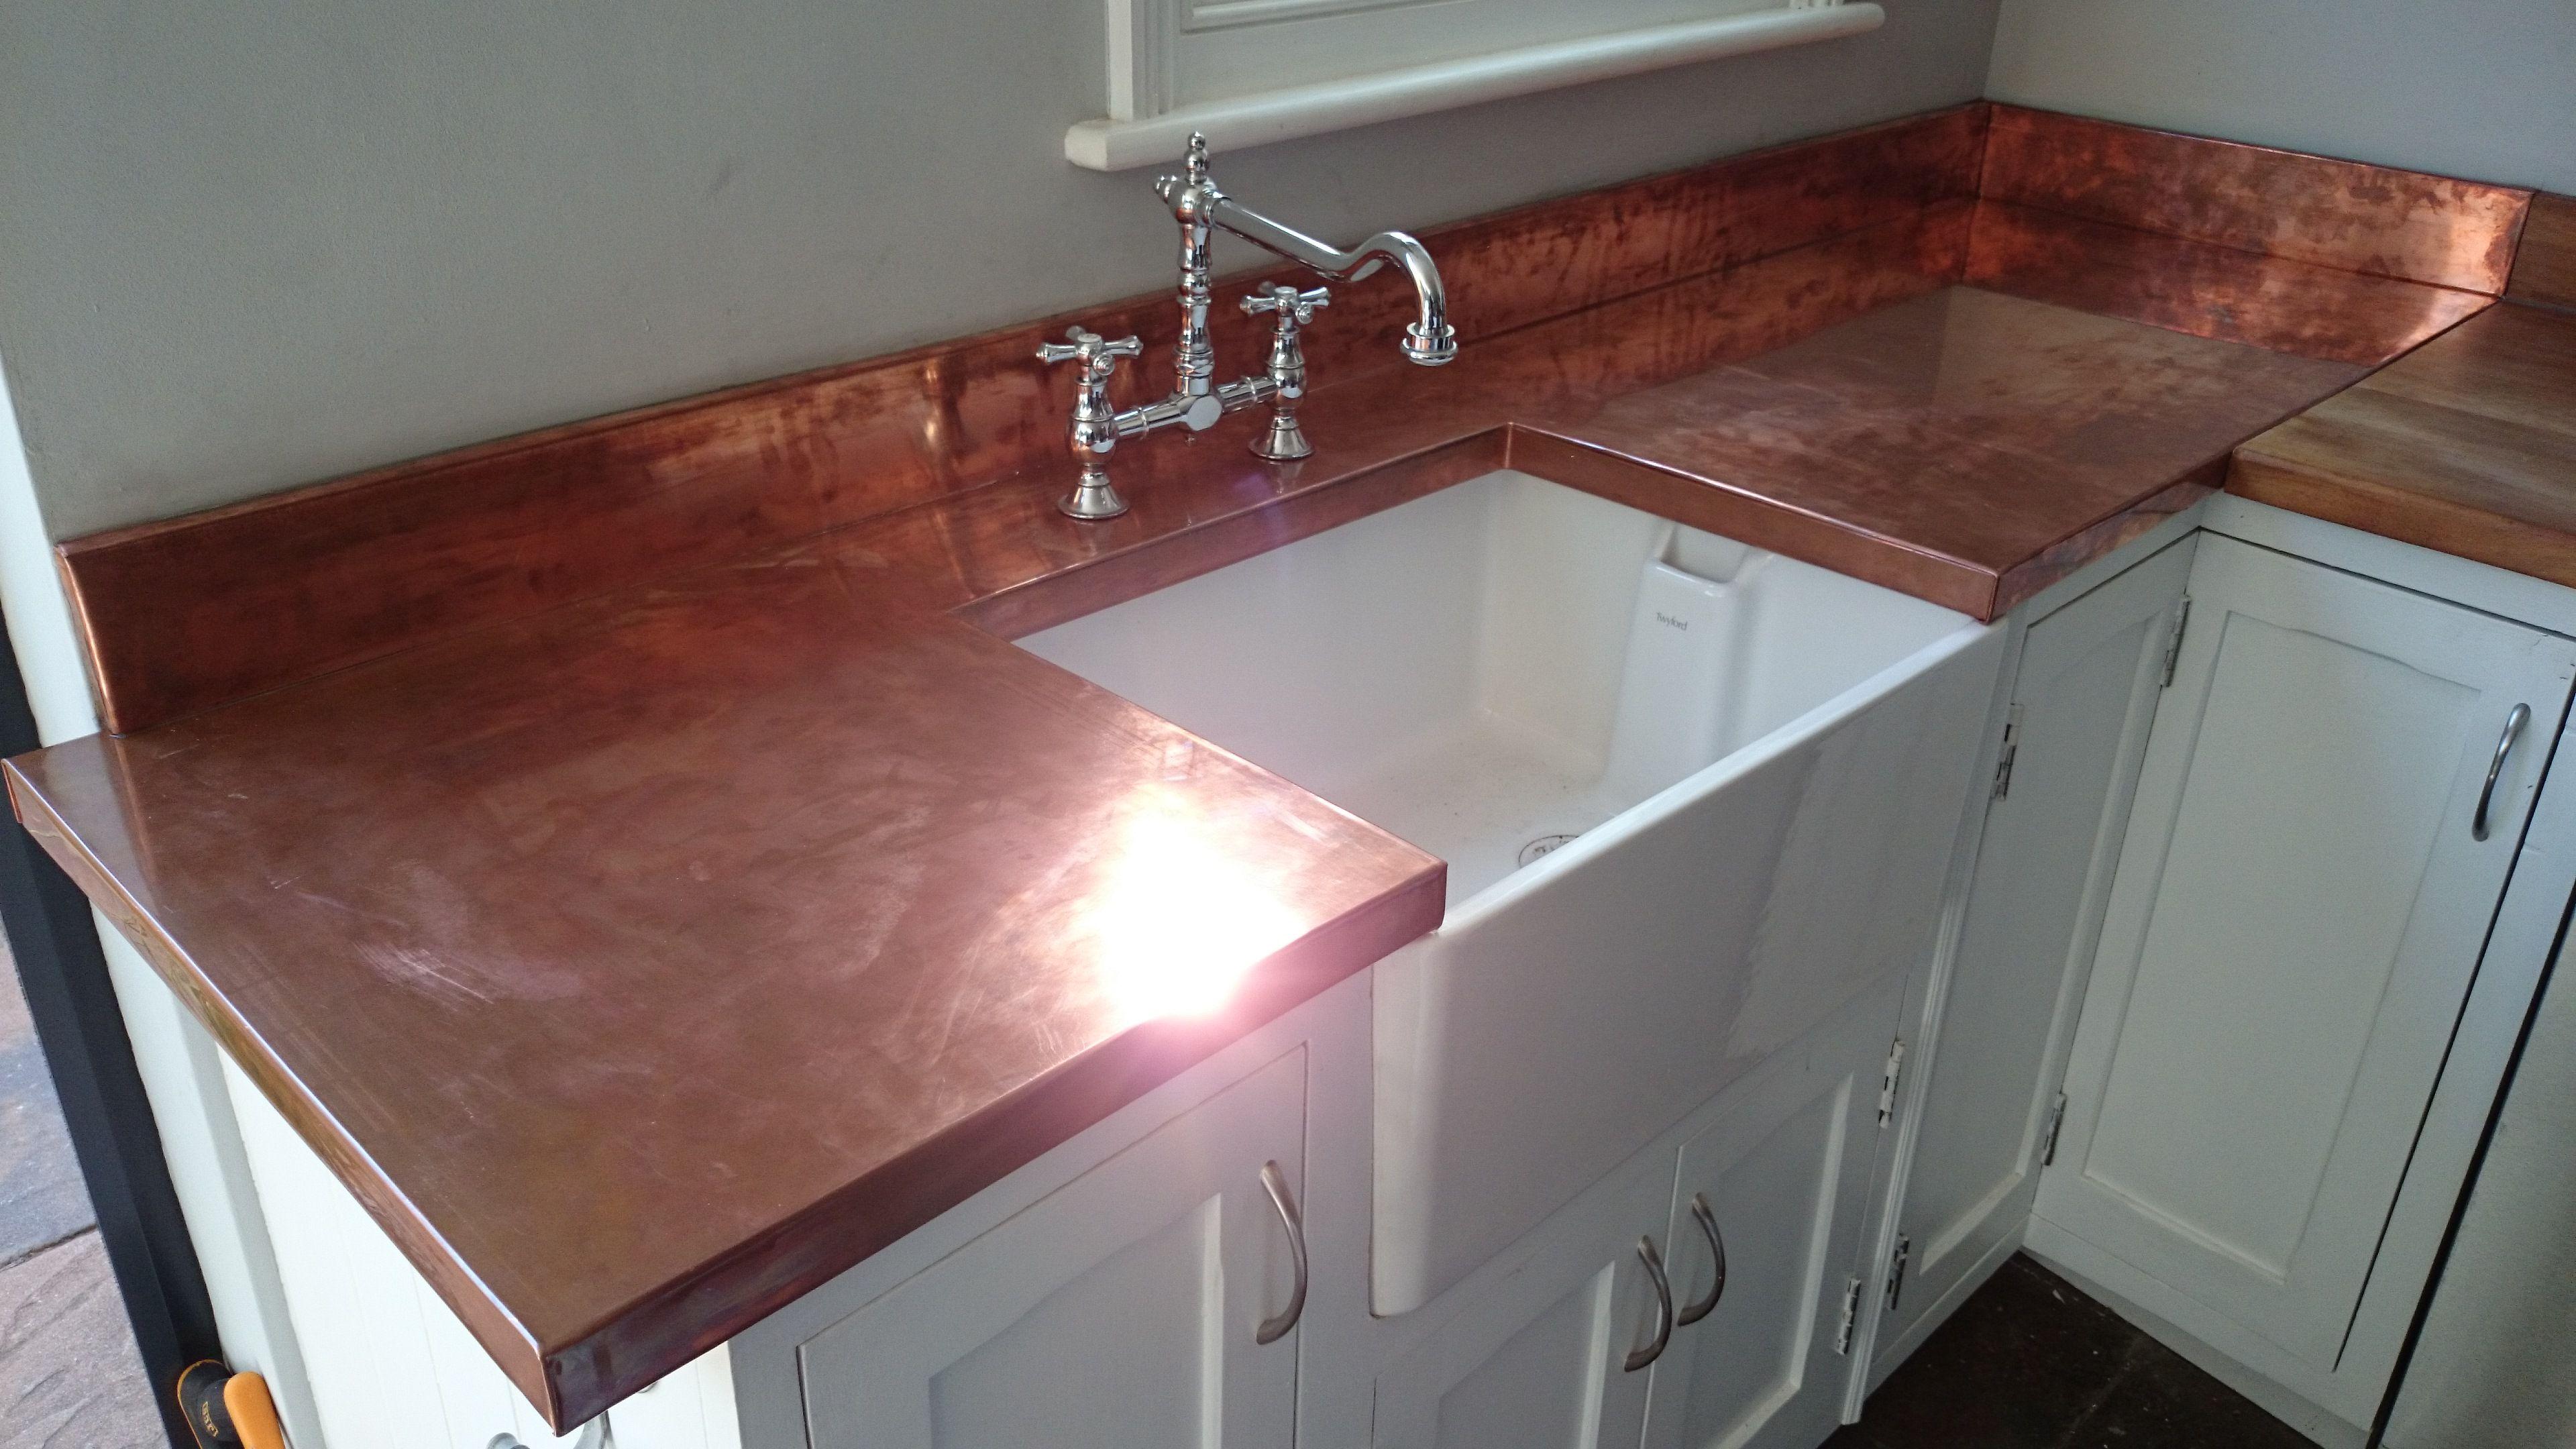 Tipfords Copper Worktop Copper Kitchen Freestanding Kitchen Copper Countertops